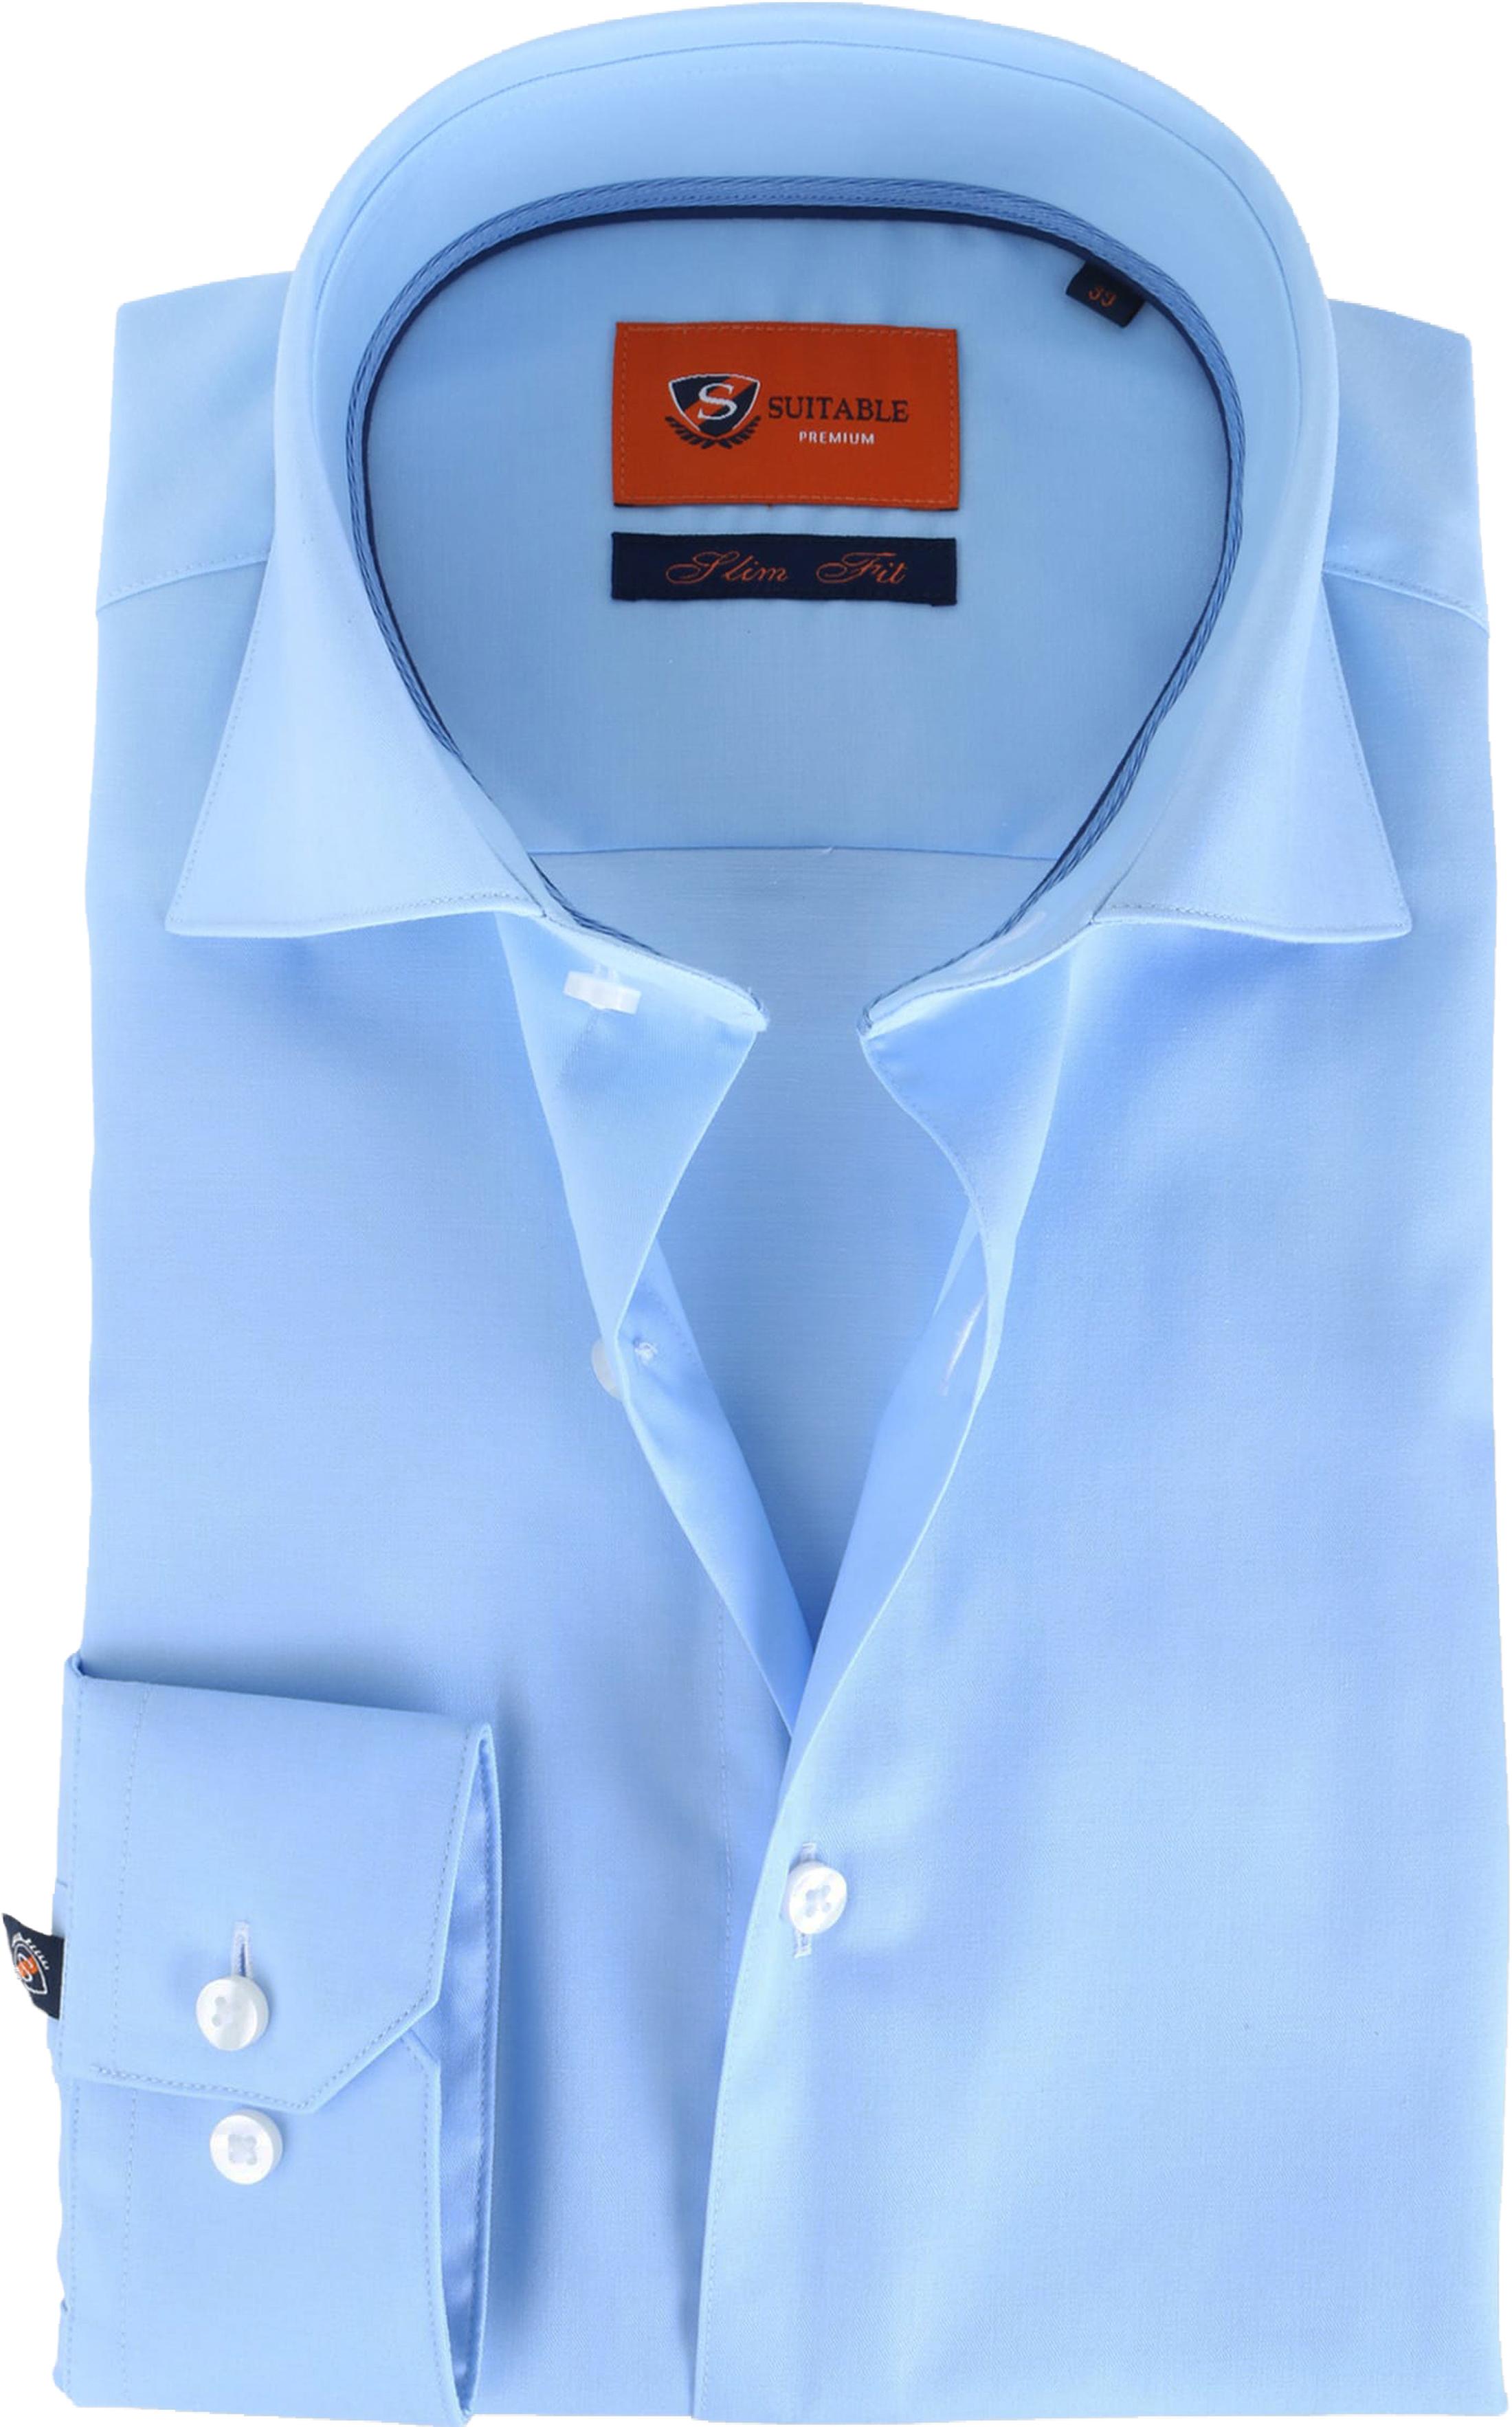 Suitable Blau Hemd Slim Fit DR-03